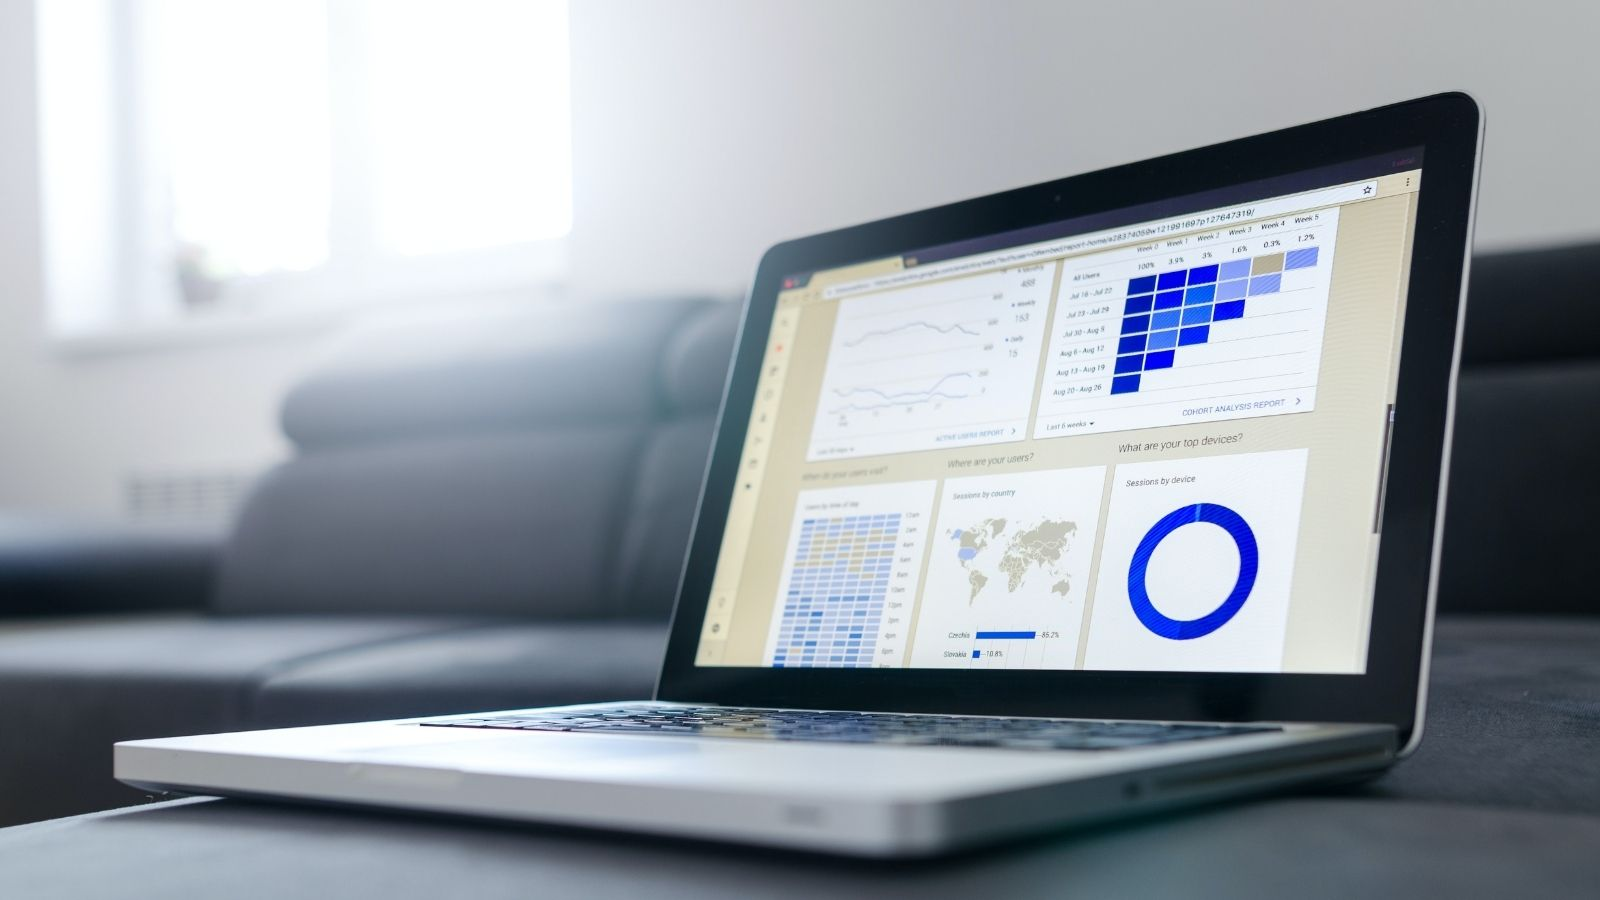 ANALIZA: Jak dotrzeć do e-konsumenta? Trendy mediarun e konsument